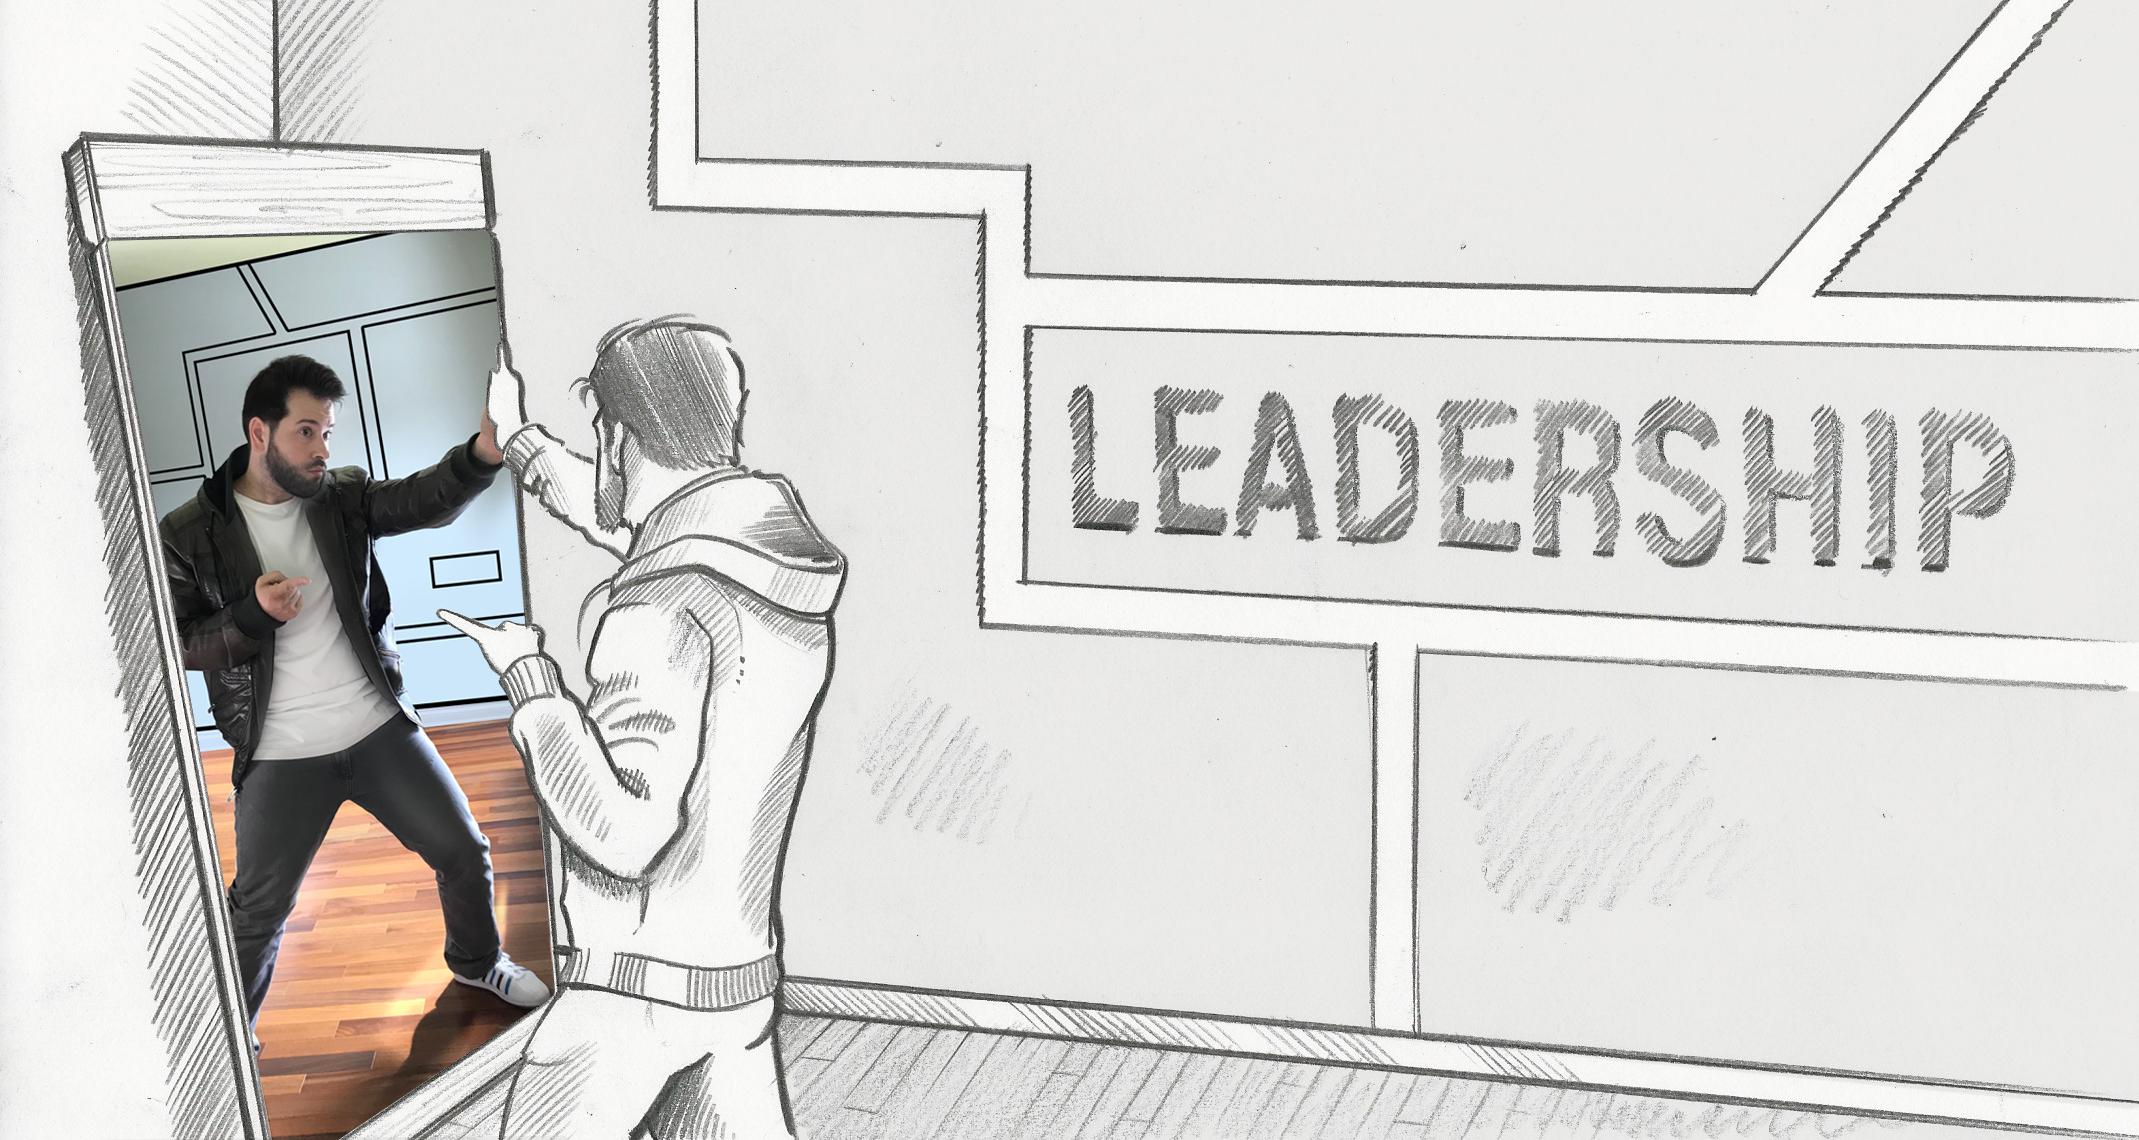 Take On Me_Fear Of Leadership